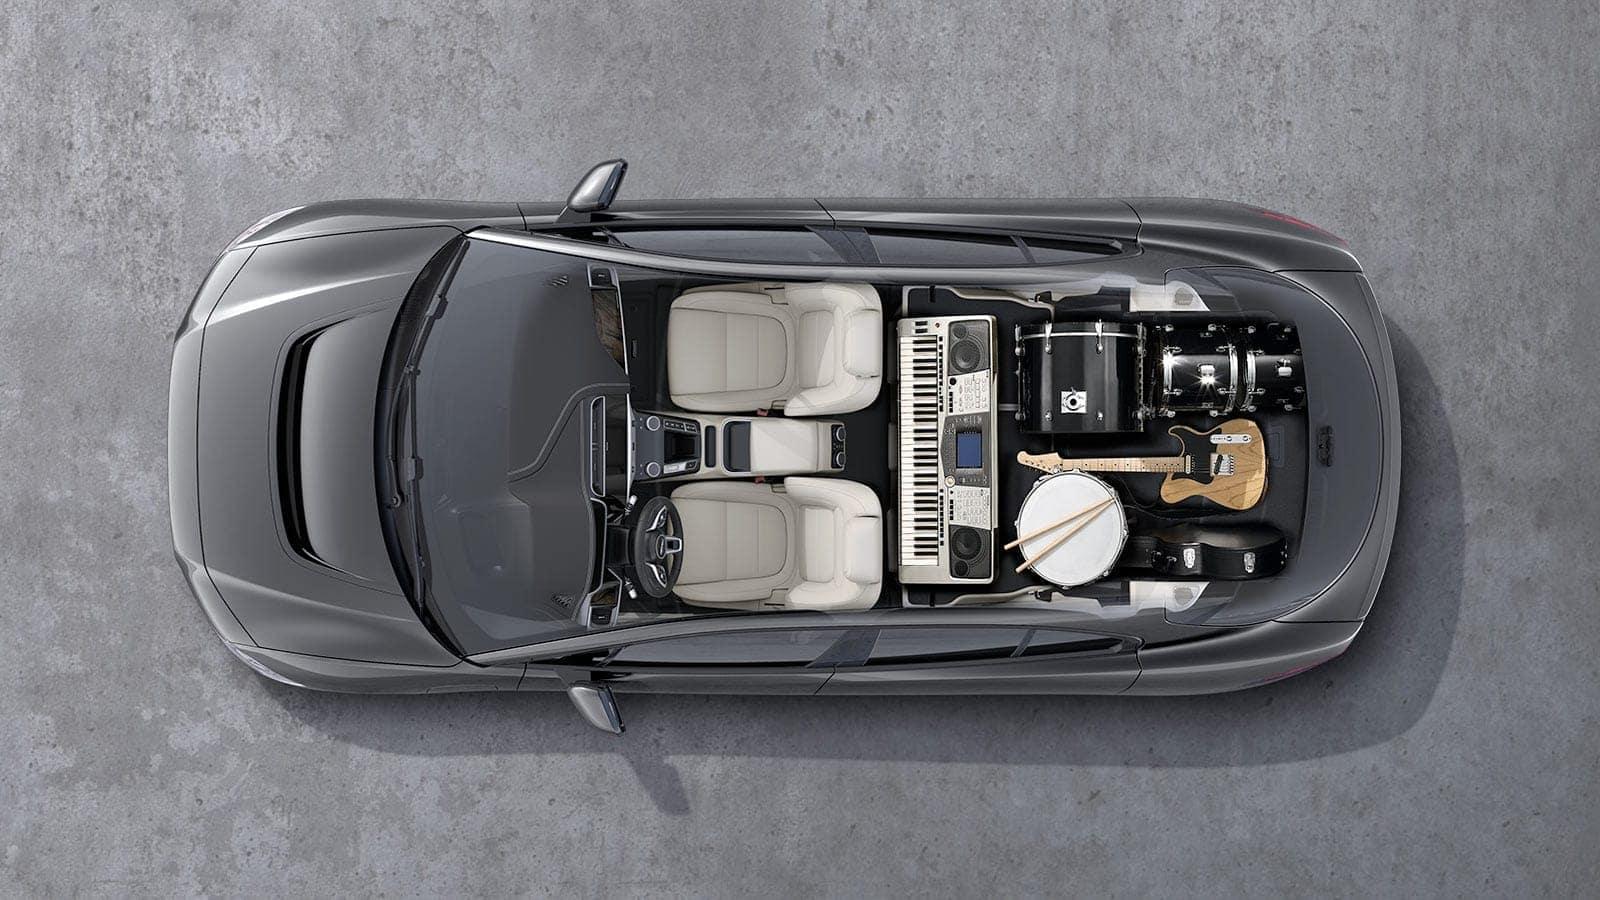 2019 Jaguar I-PACE interior overview